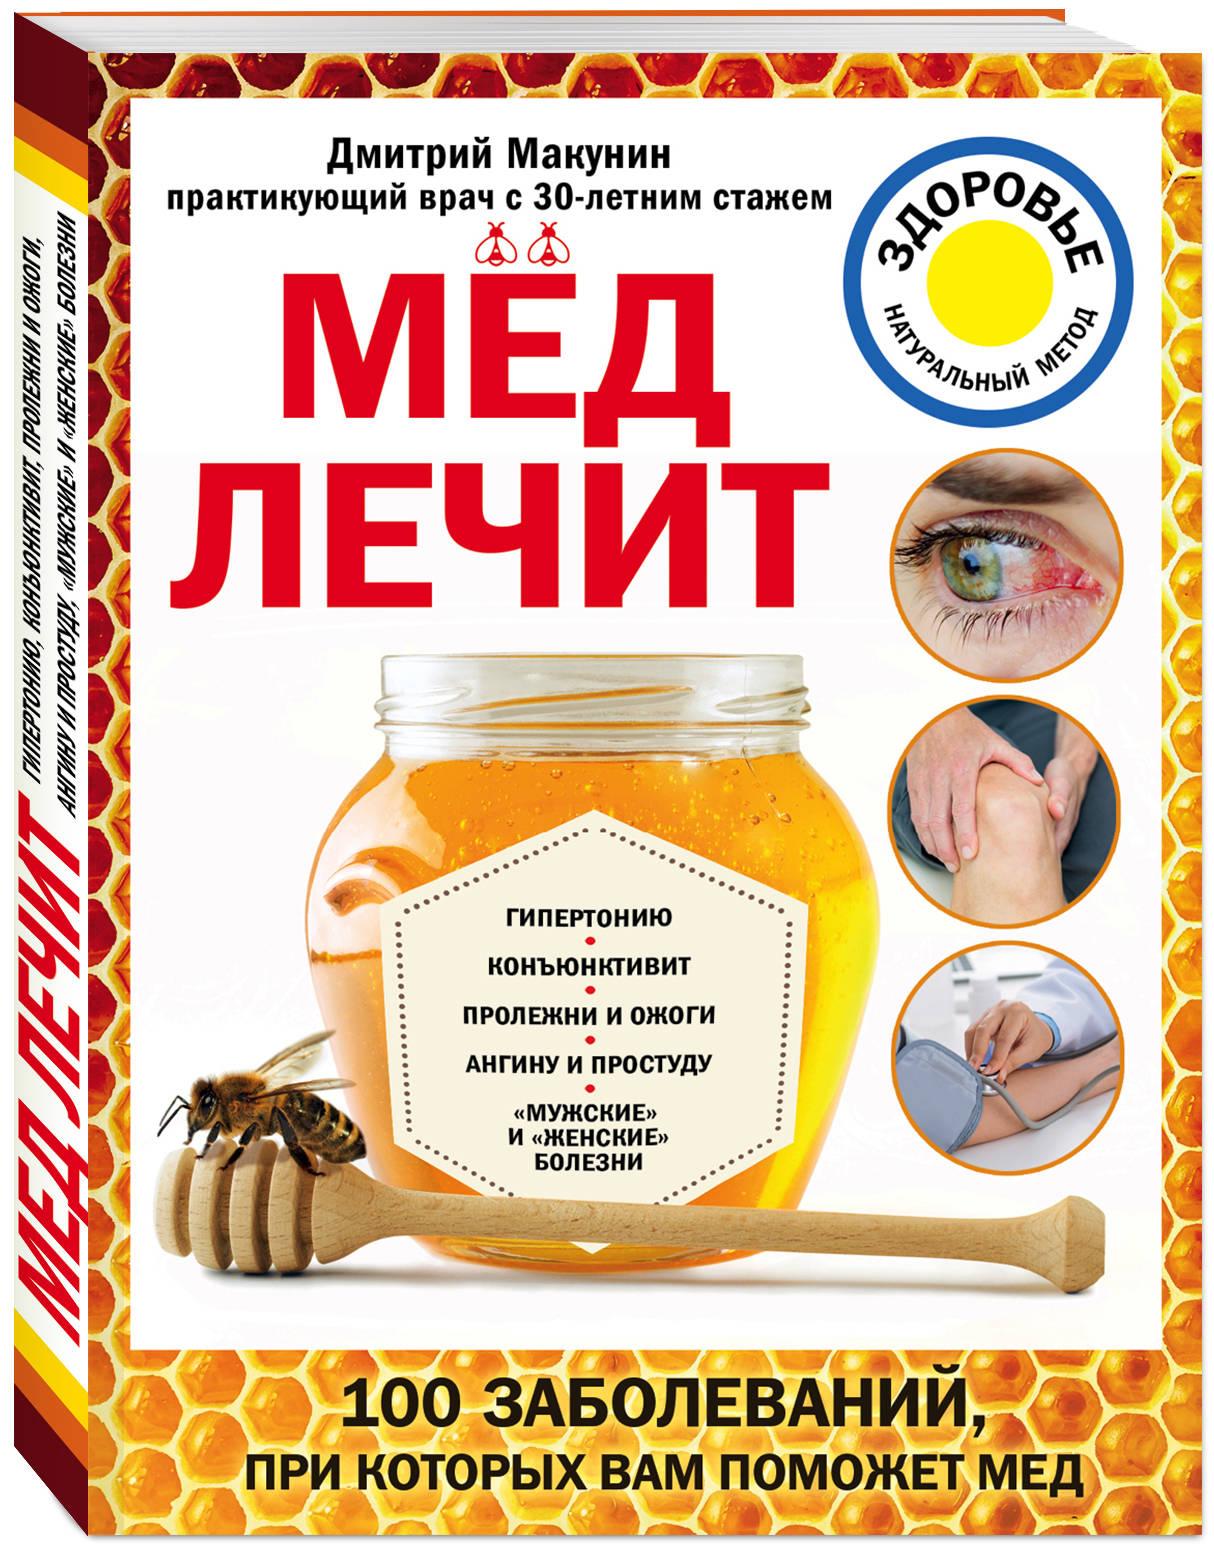 Макунин Д.А. Мед лечит: гипертонию, конъюктивит, пролежни и ожоги, мужские и женские болезни